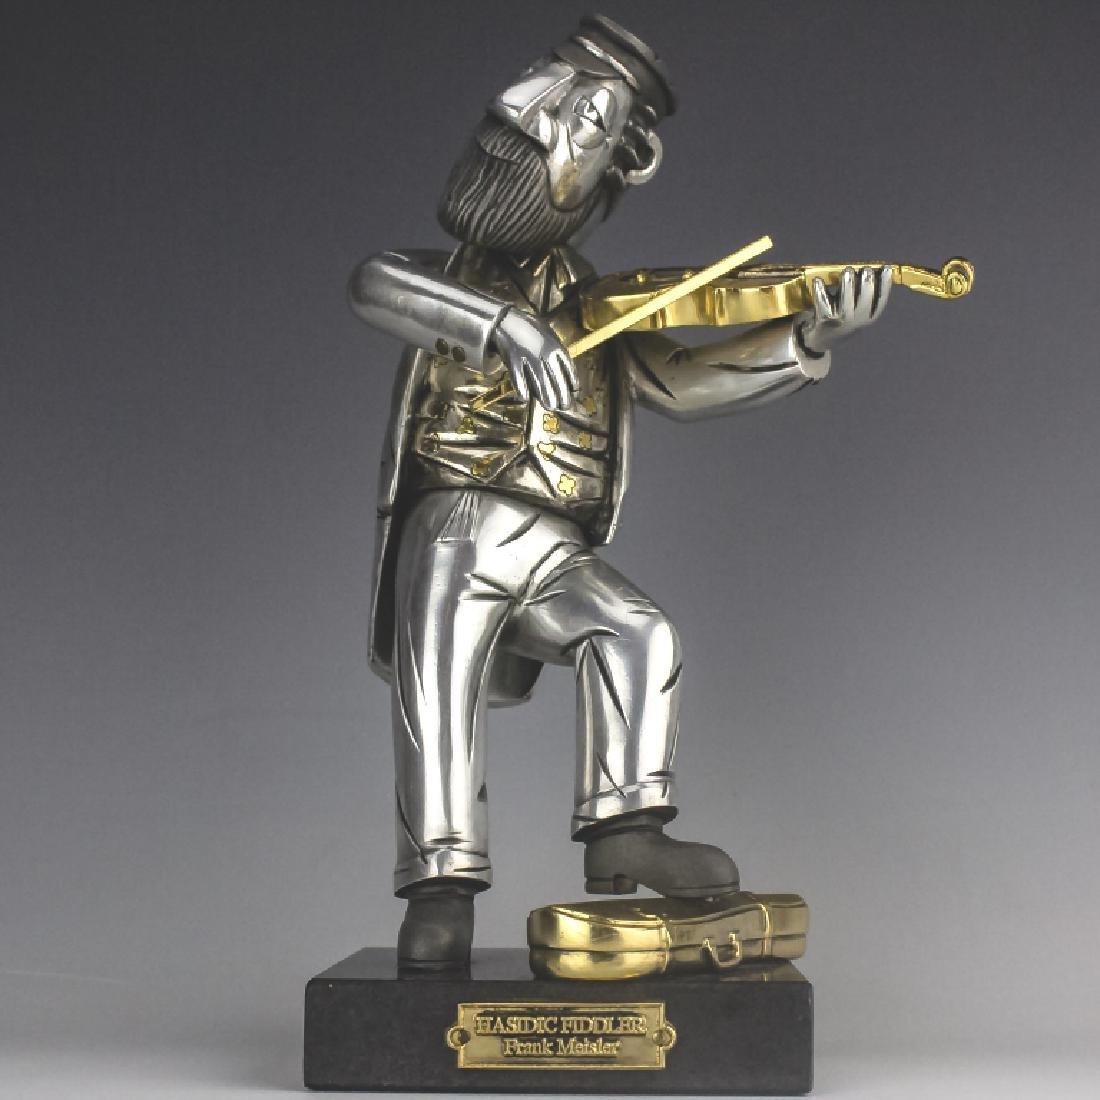 Frank Meisler b.1929 Hasidic Fiddler Sculpture